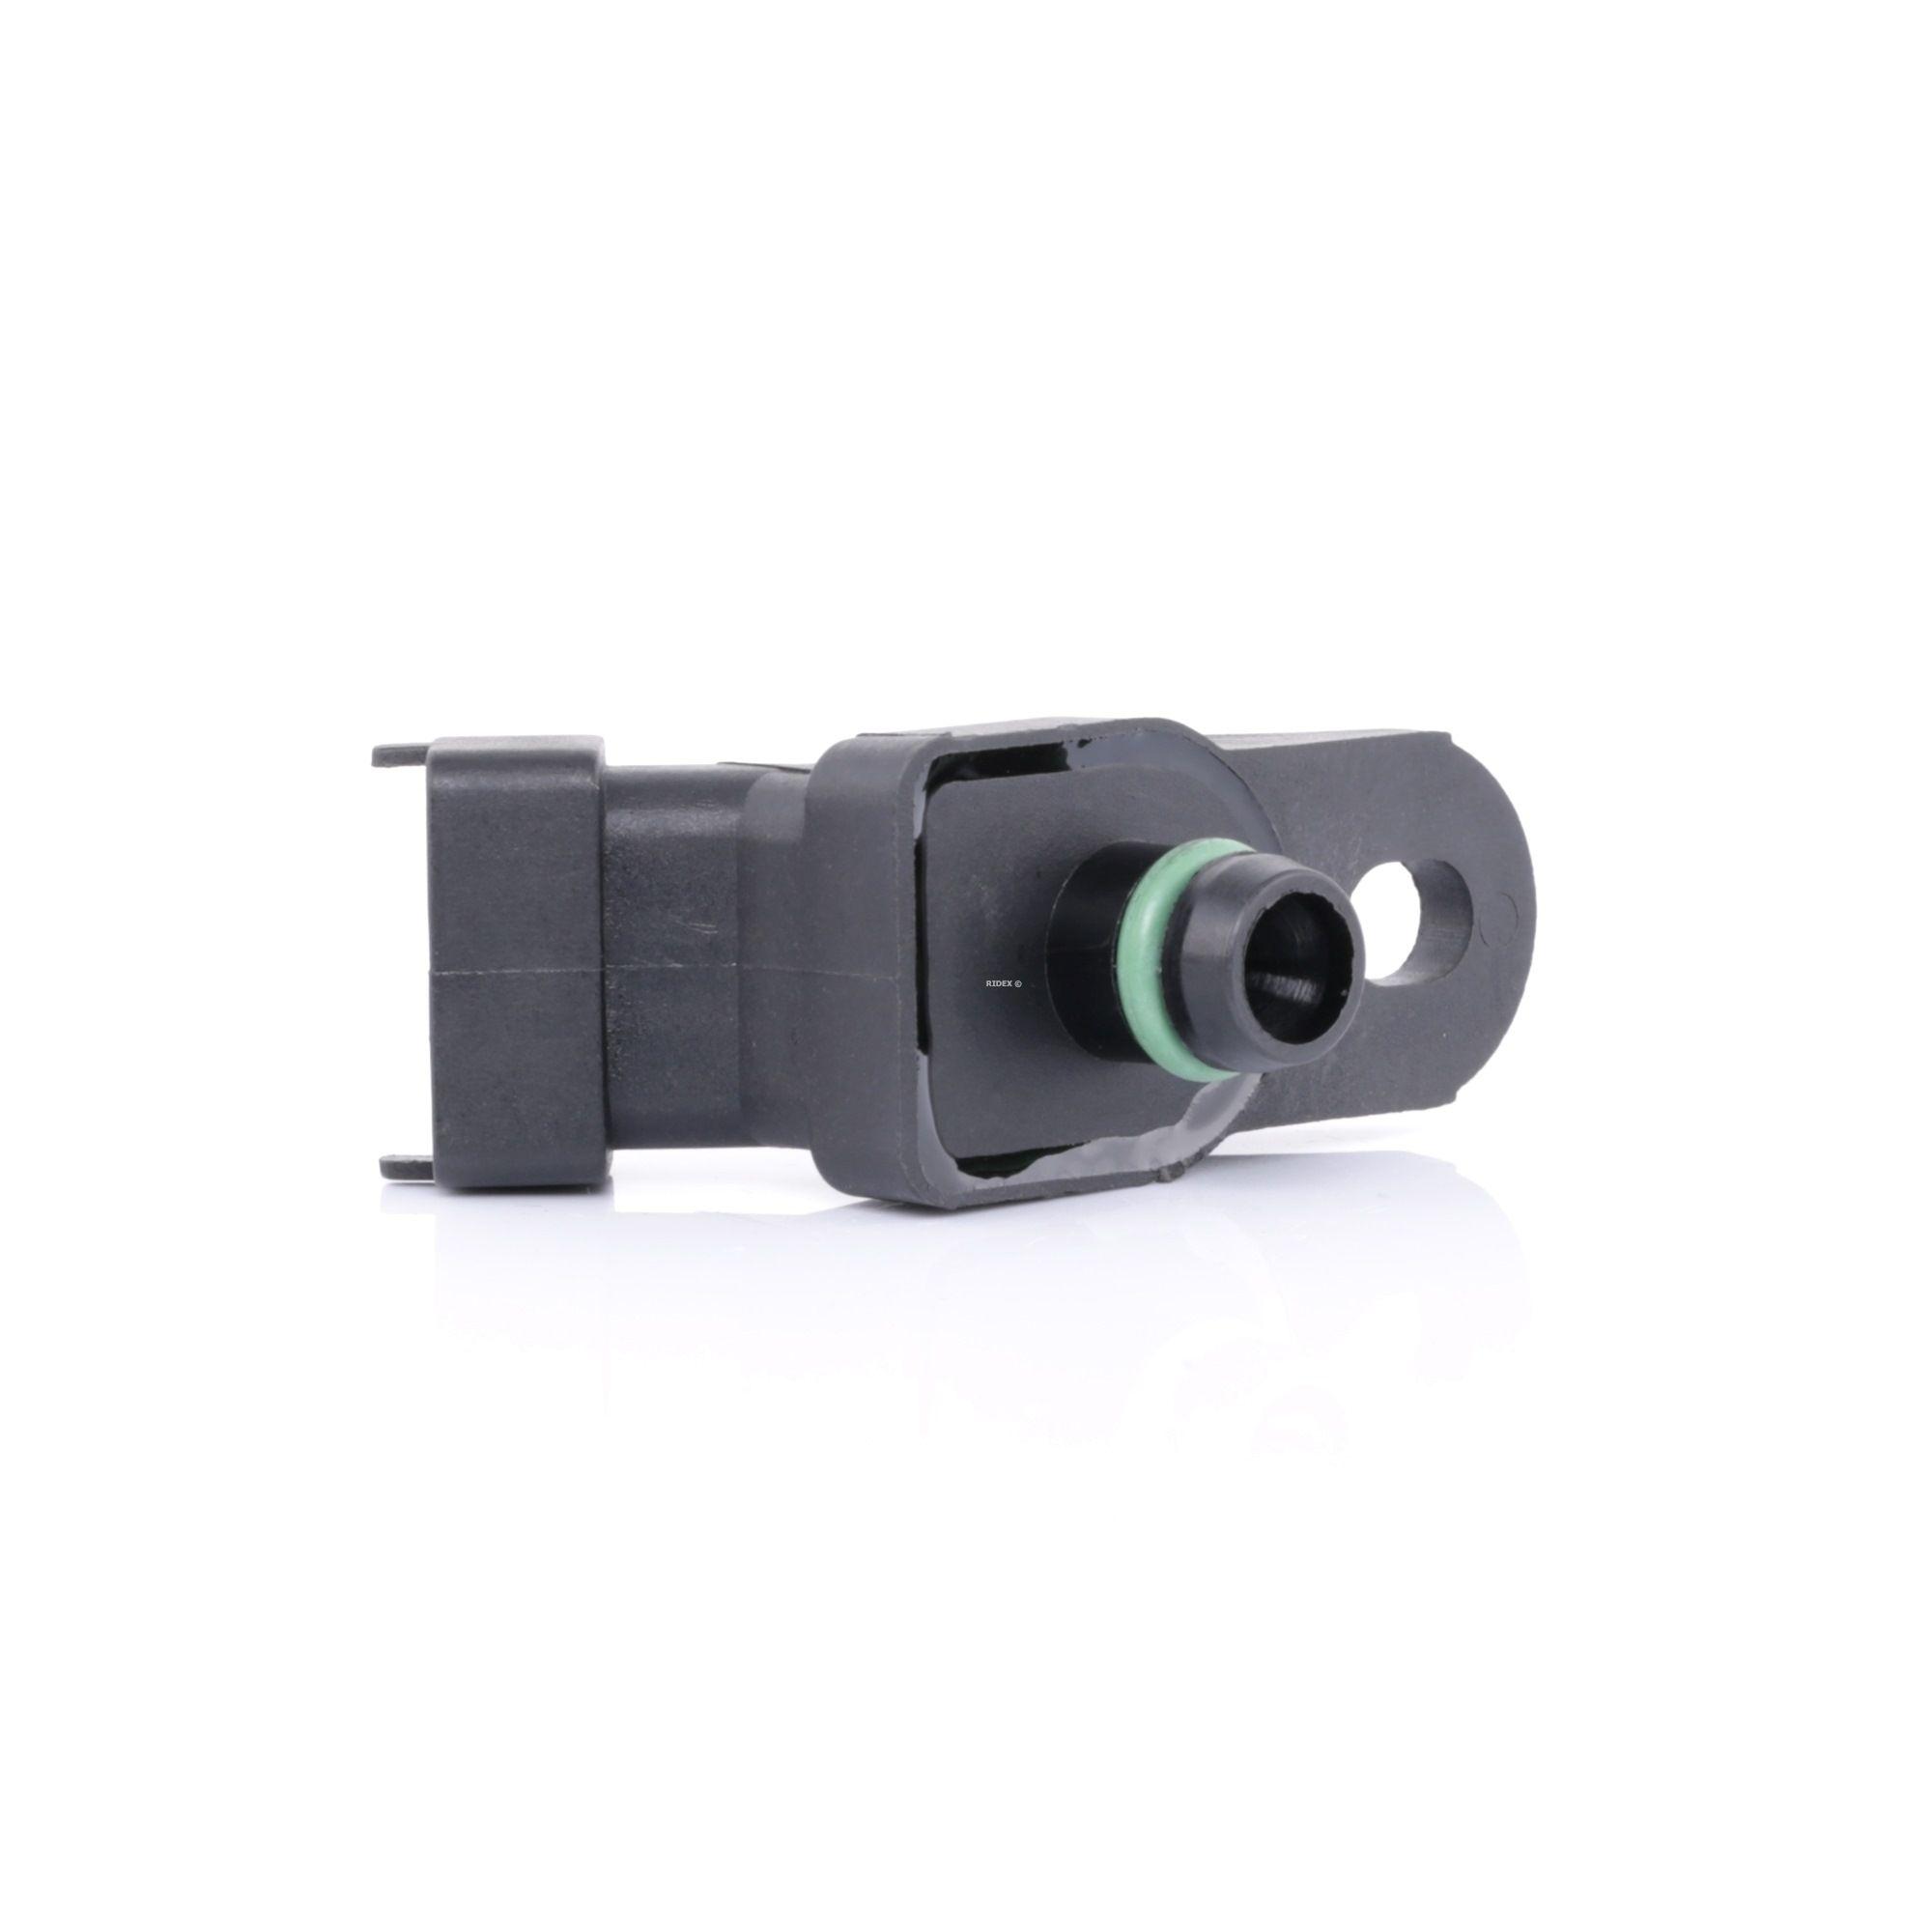 OPEL ASTRA 2021 Ladedrucksensor - Original RIDEX 161B0040 Pol-Anzahl: 3-polig